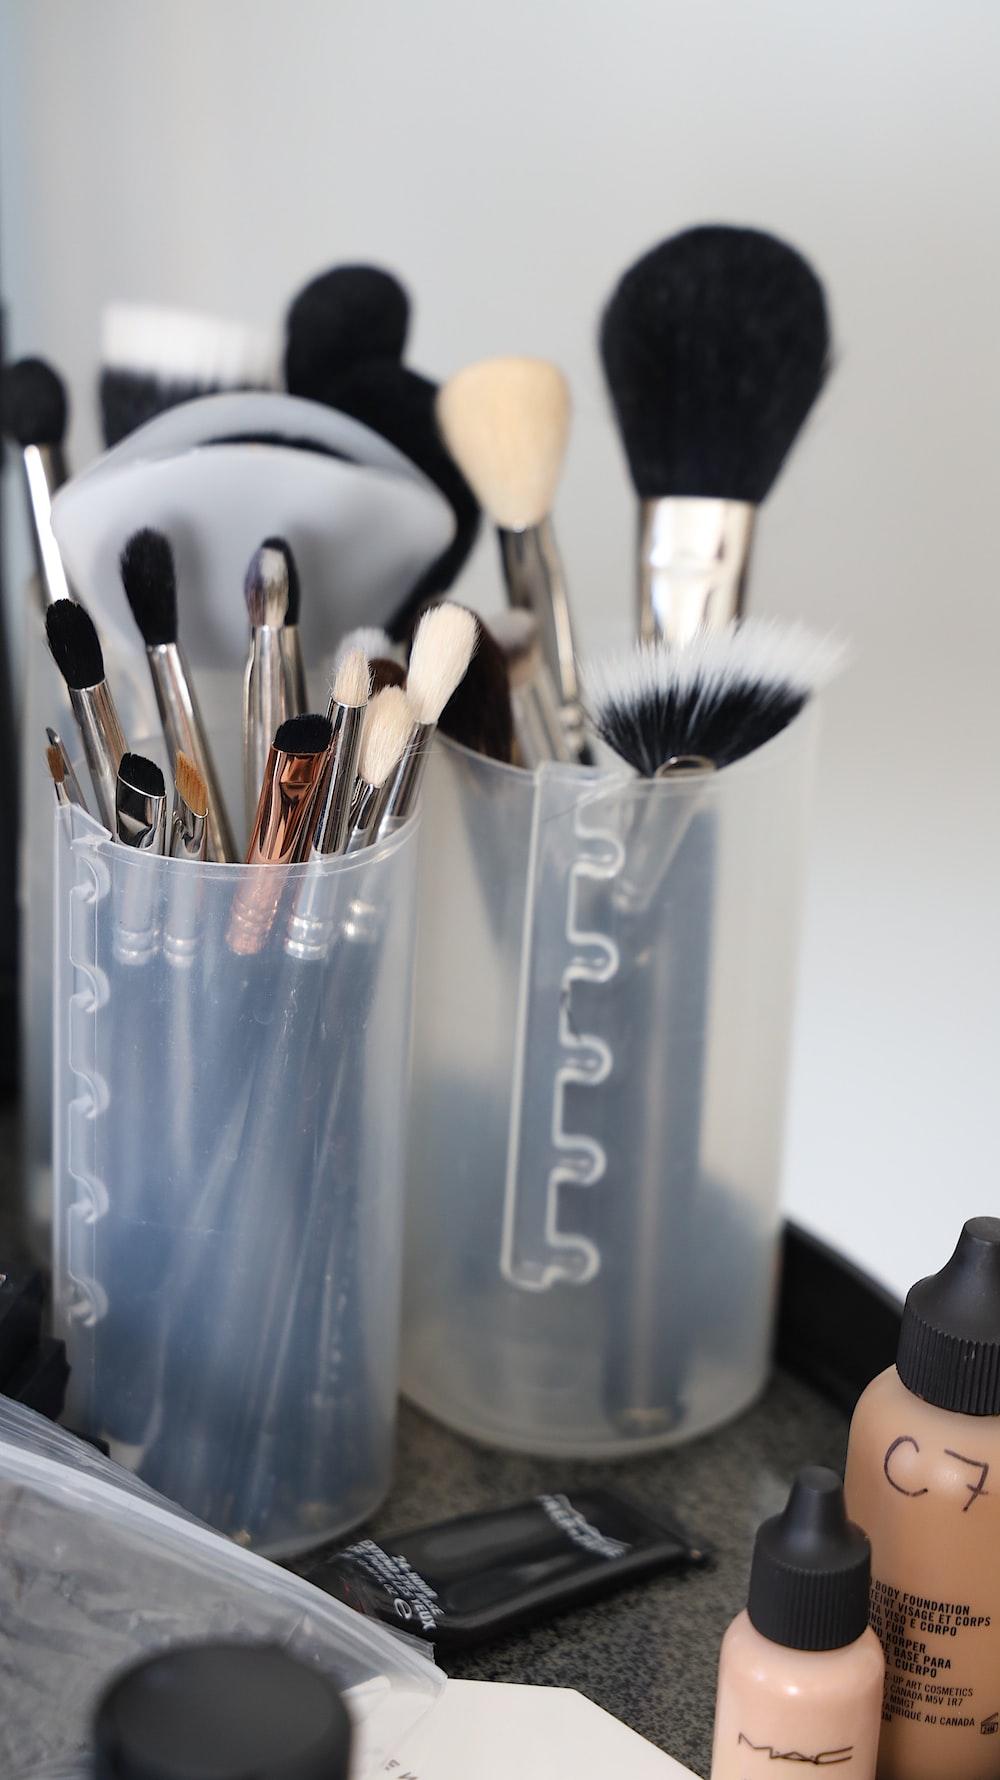 make-up brushes on white plastic organizers